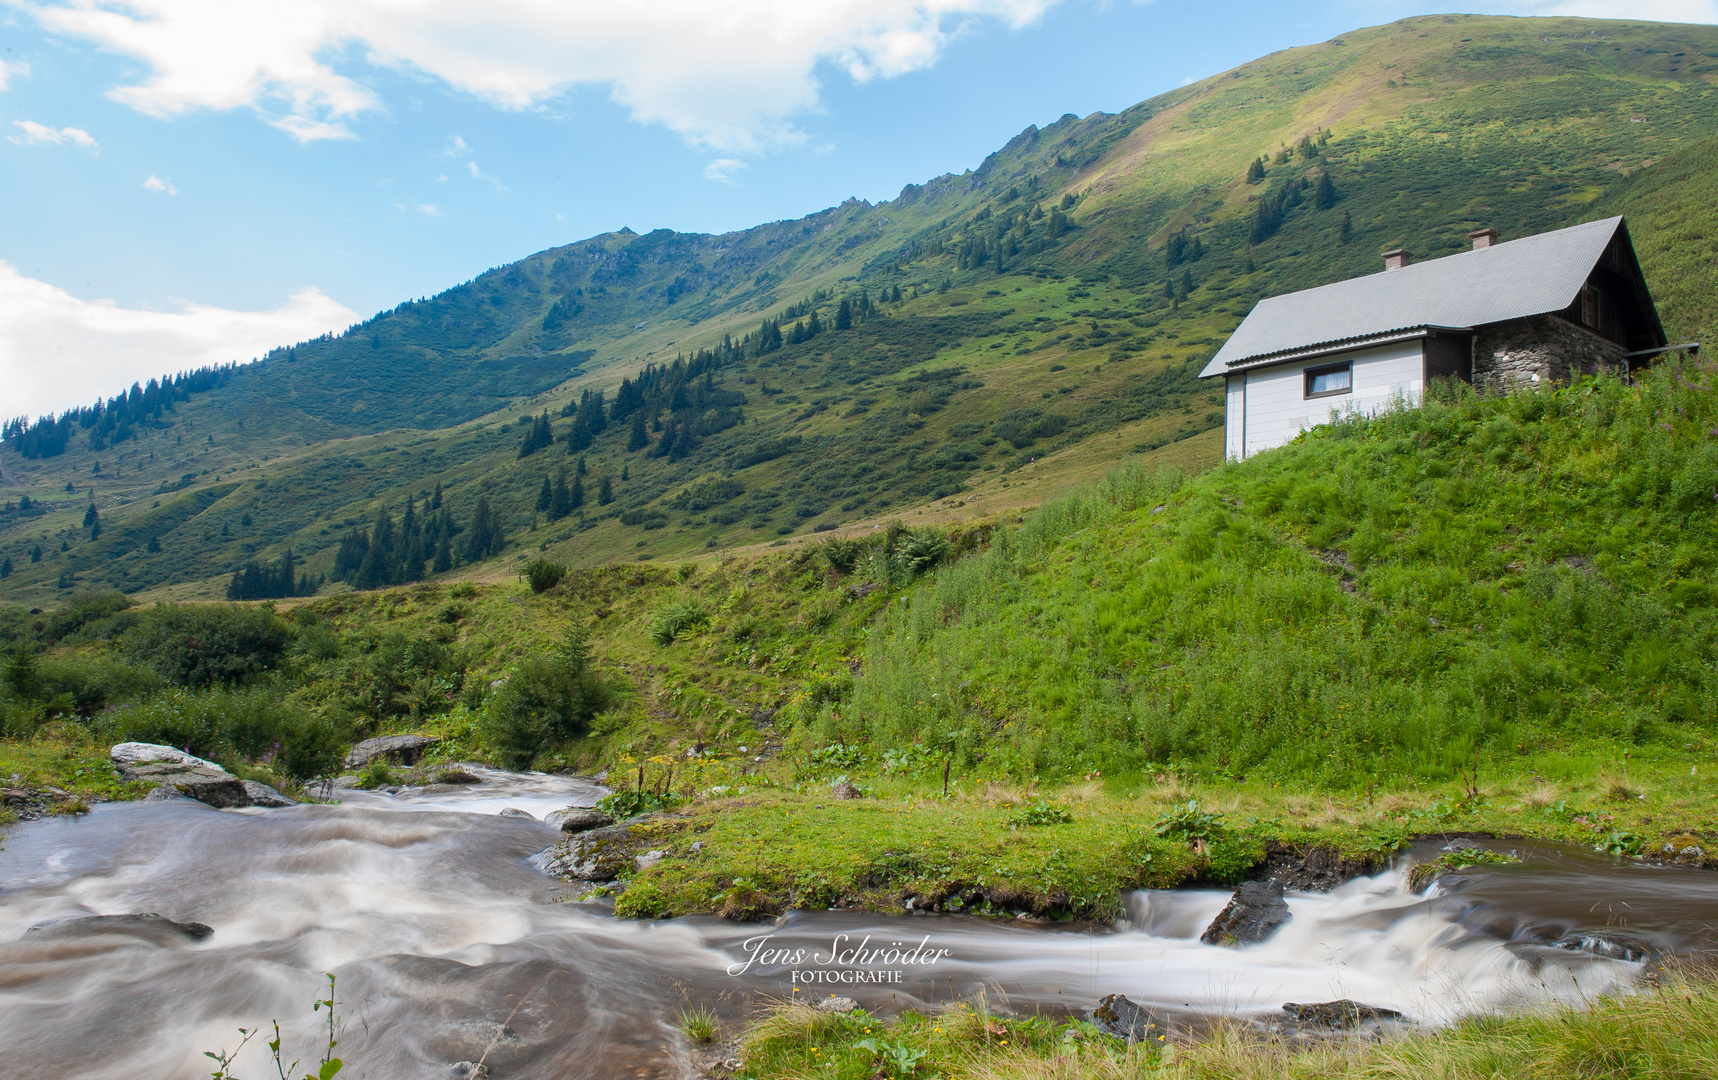 Berghütte Planneralm